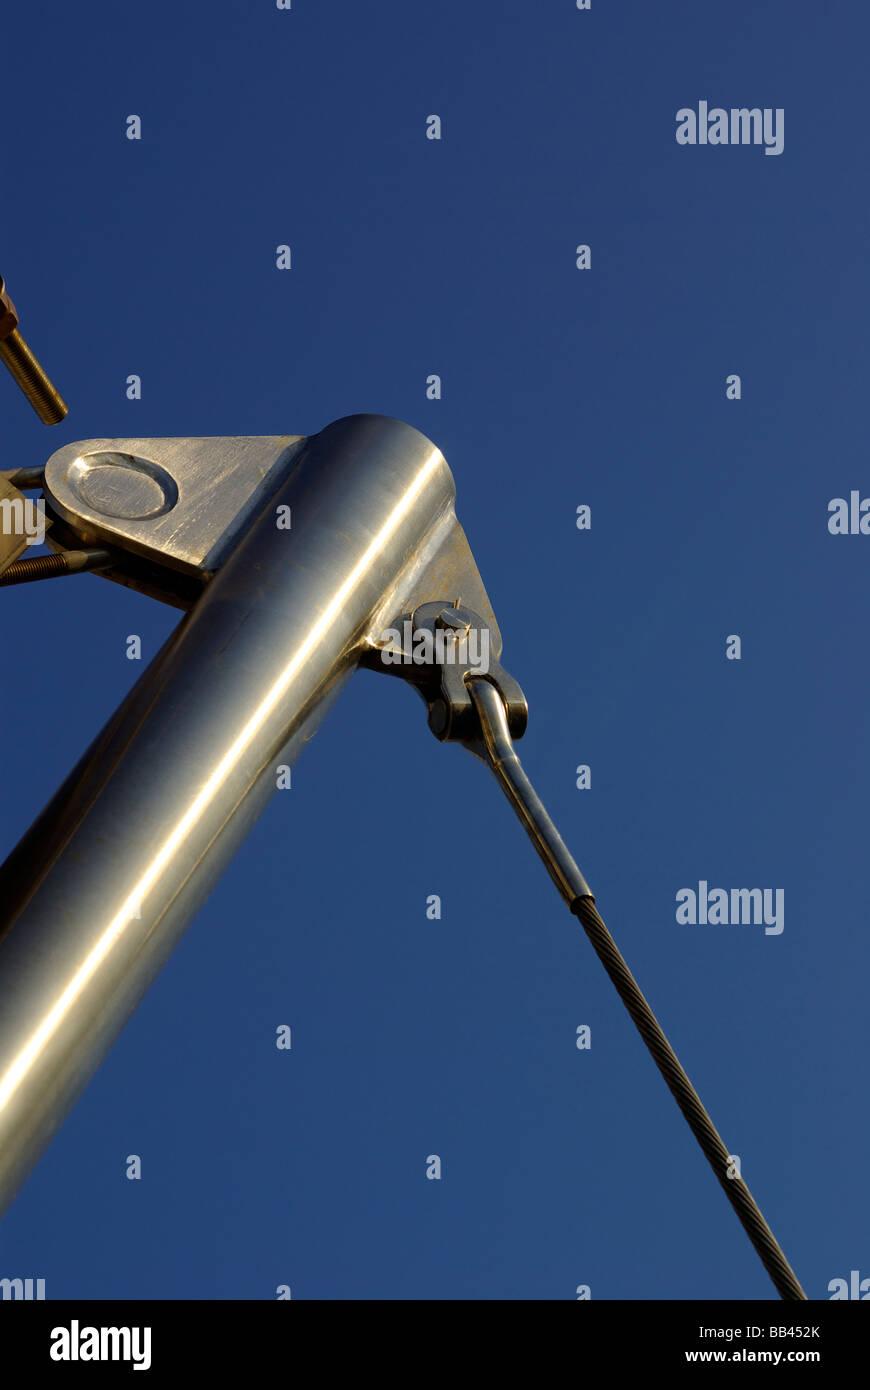 Markise Befestigung Schakel Stockfoto Bild 24063387 Alamy